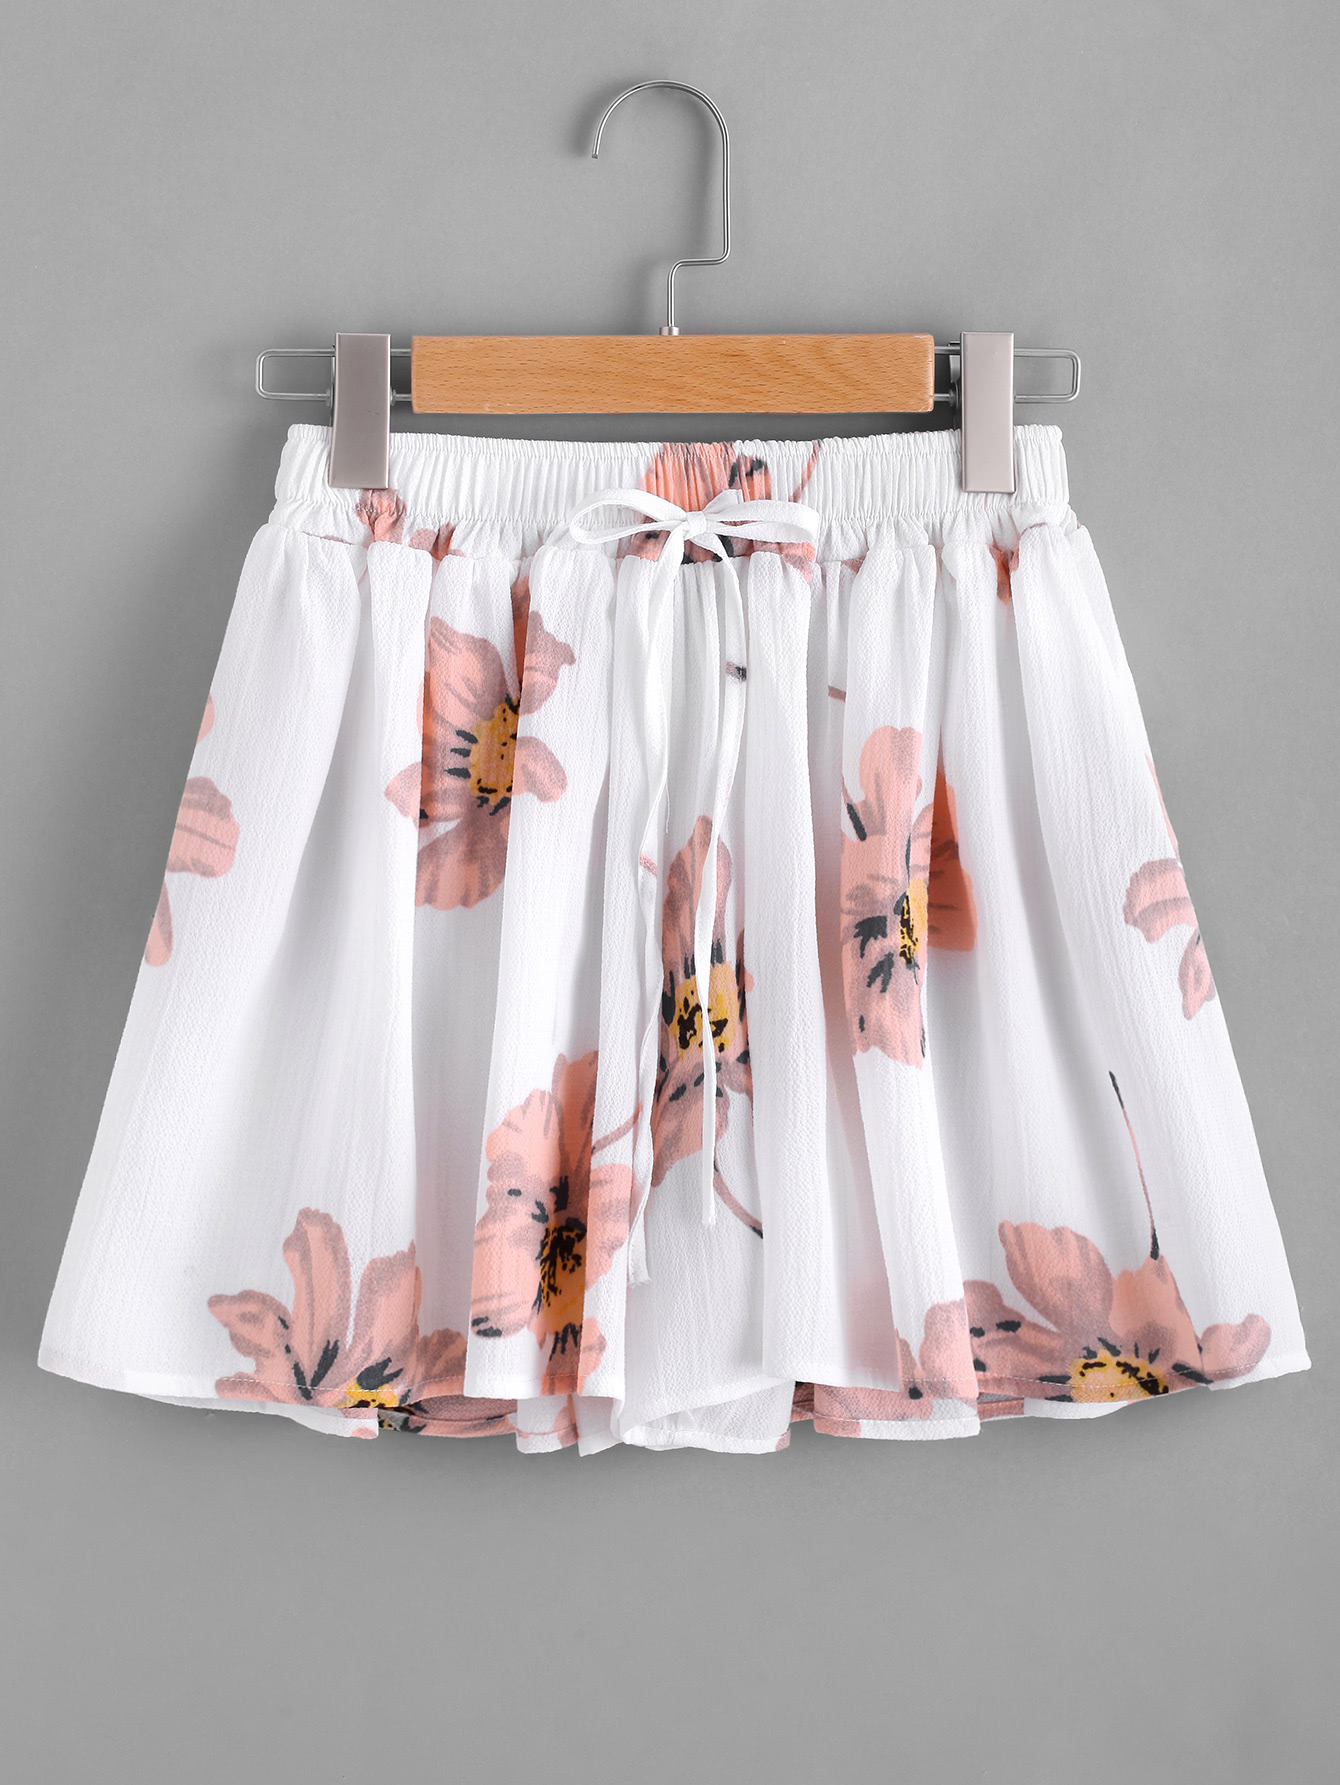 Floral Print Drawstring Skirt Shorts